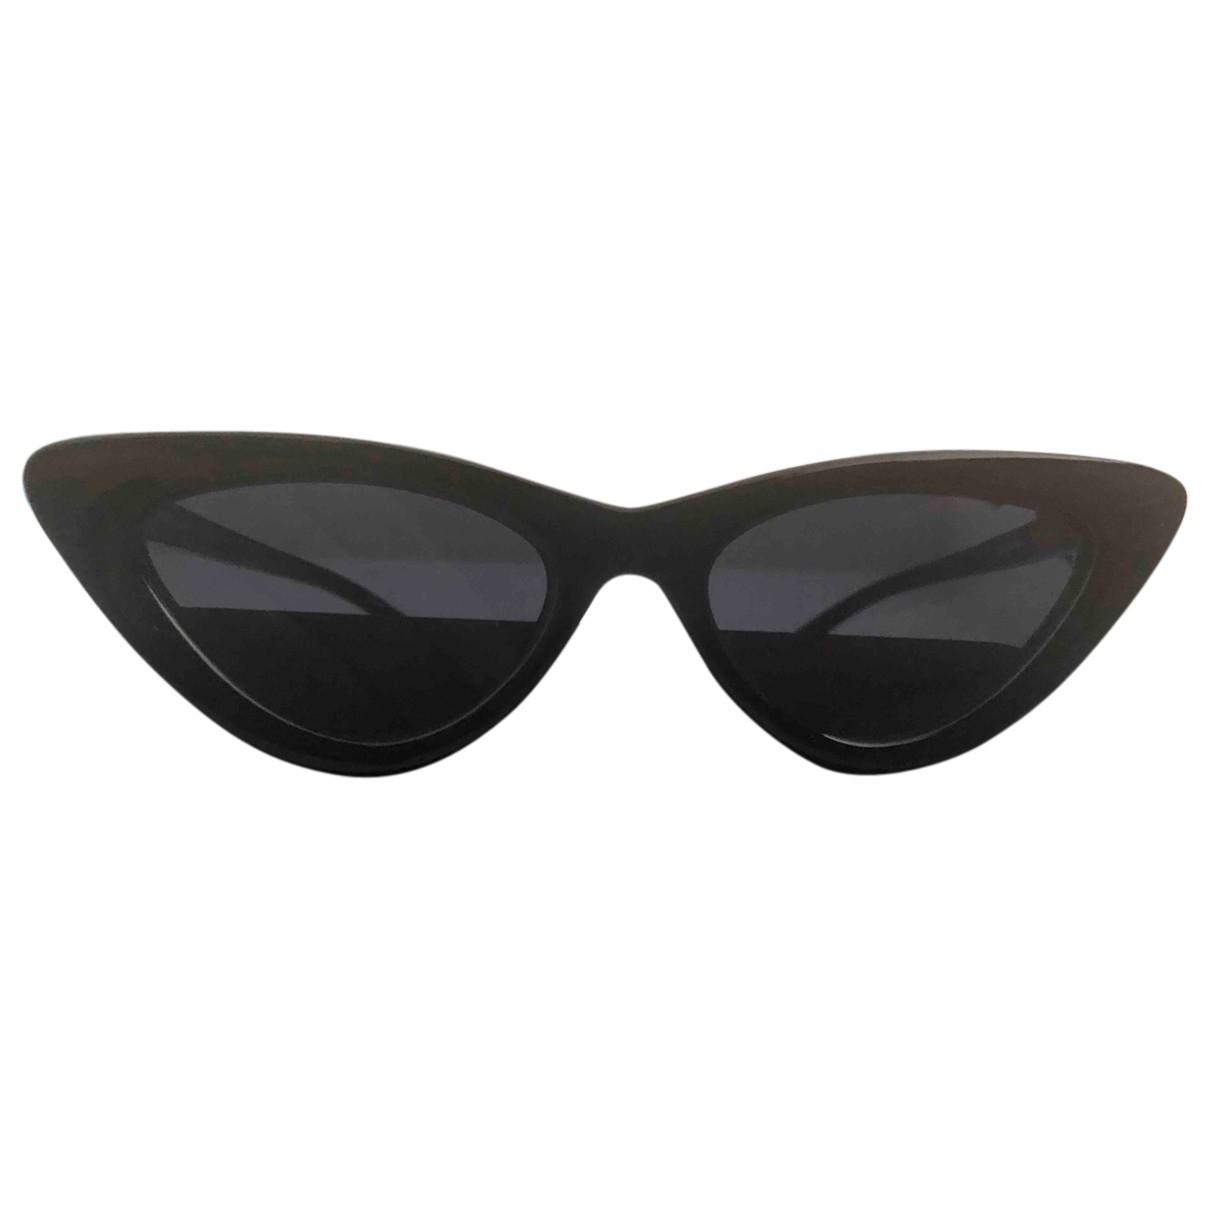 Gafas Adam Selman